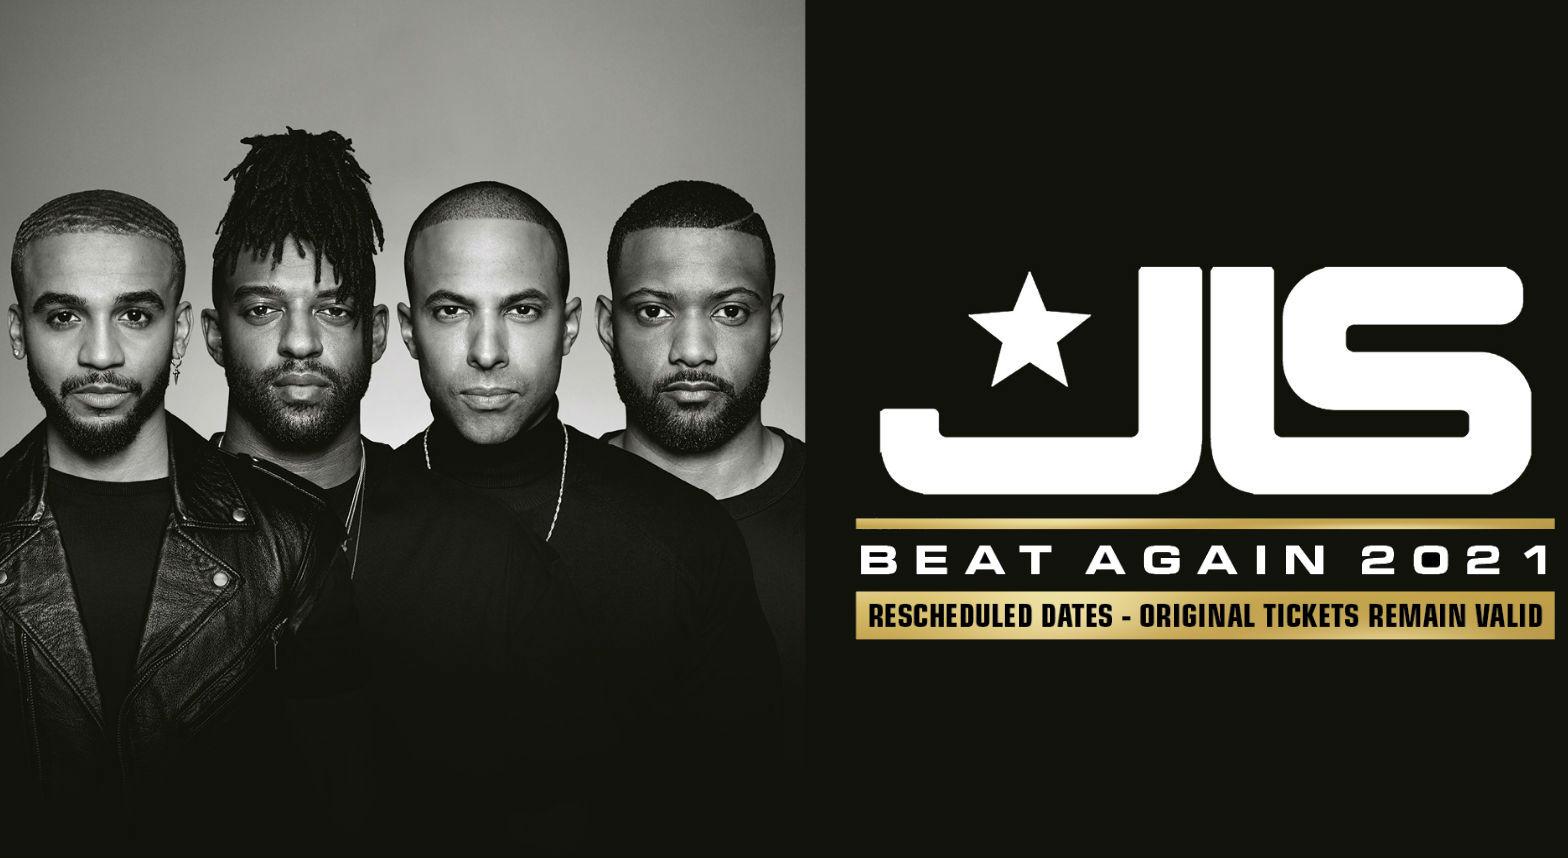 JLS_New-arenas.jpg